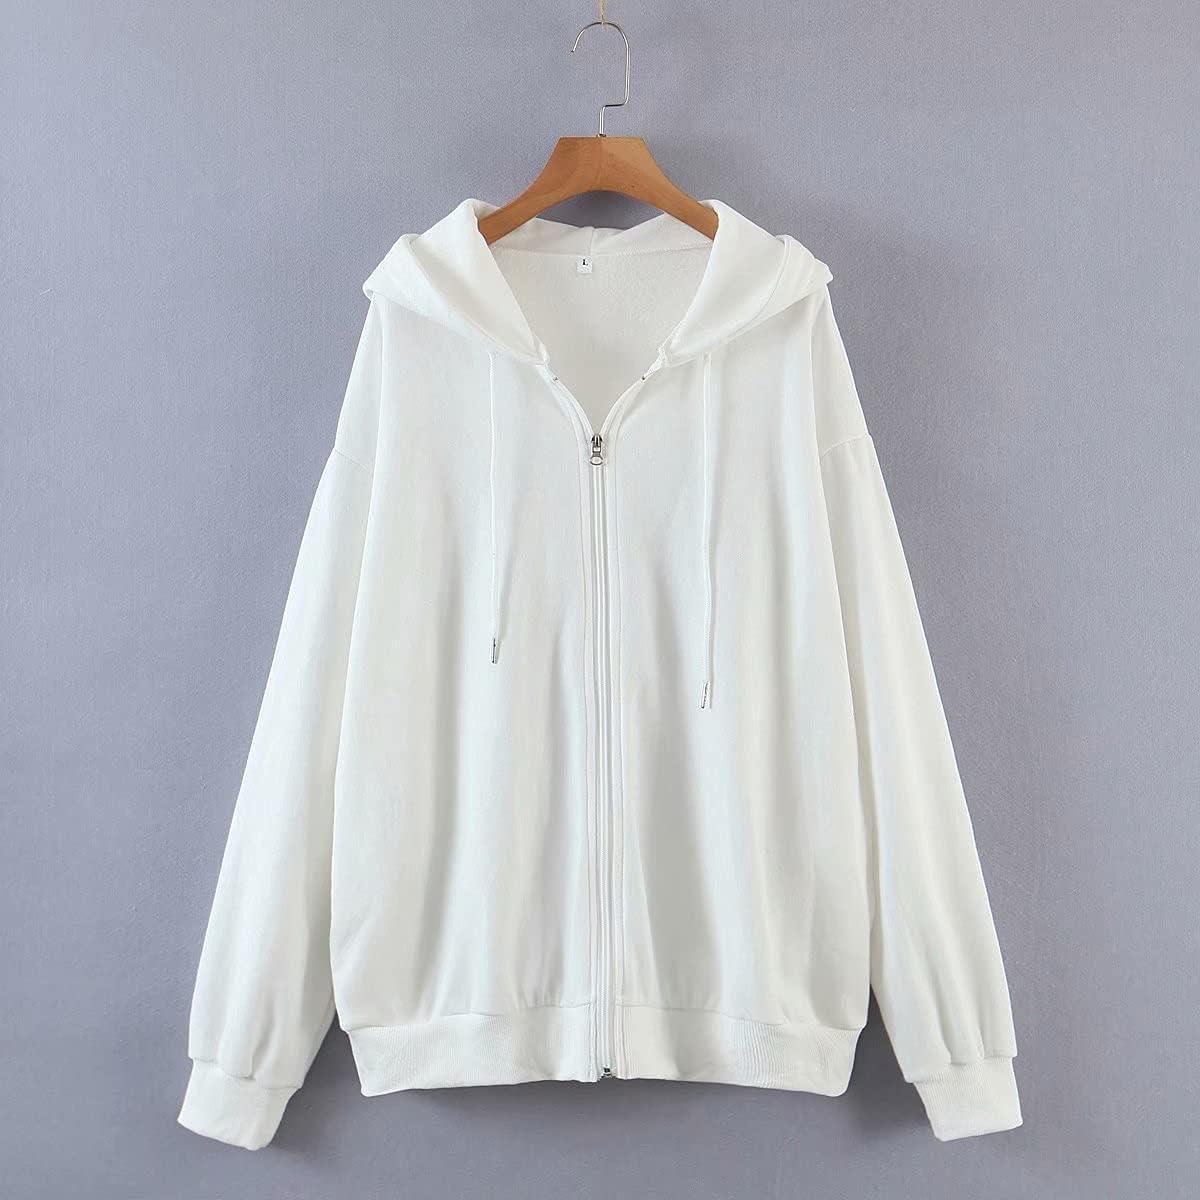 Meladyan Women Oversized Solid Zip Up Hoodie Drawstring Hooded Long Sleeve Fleece Vintage Sweatshirts Jackets Pockets 90s